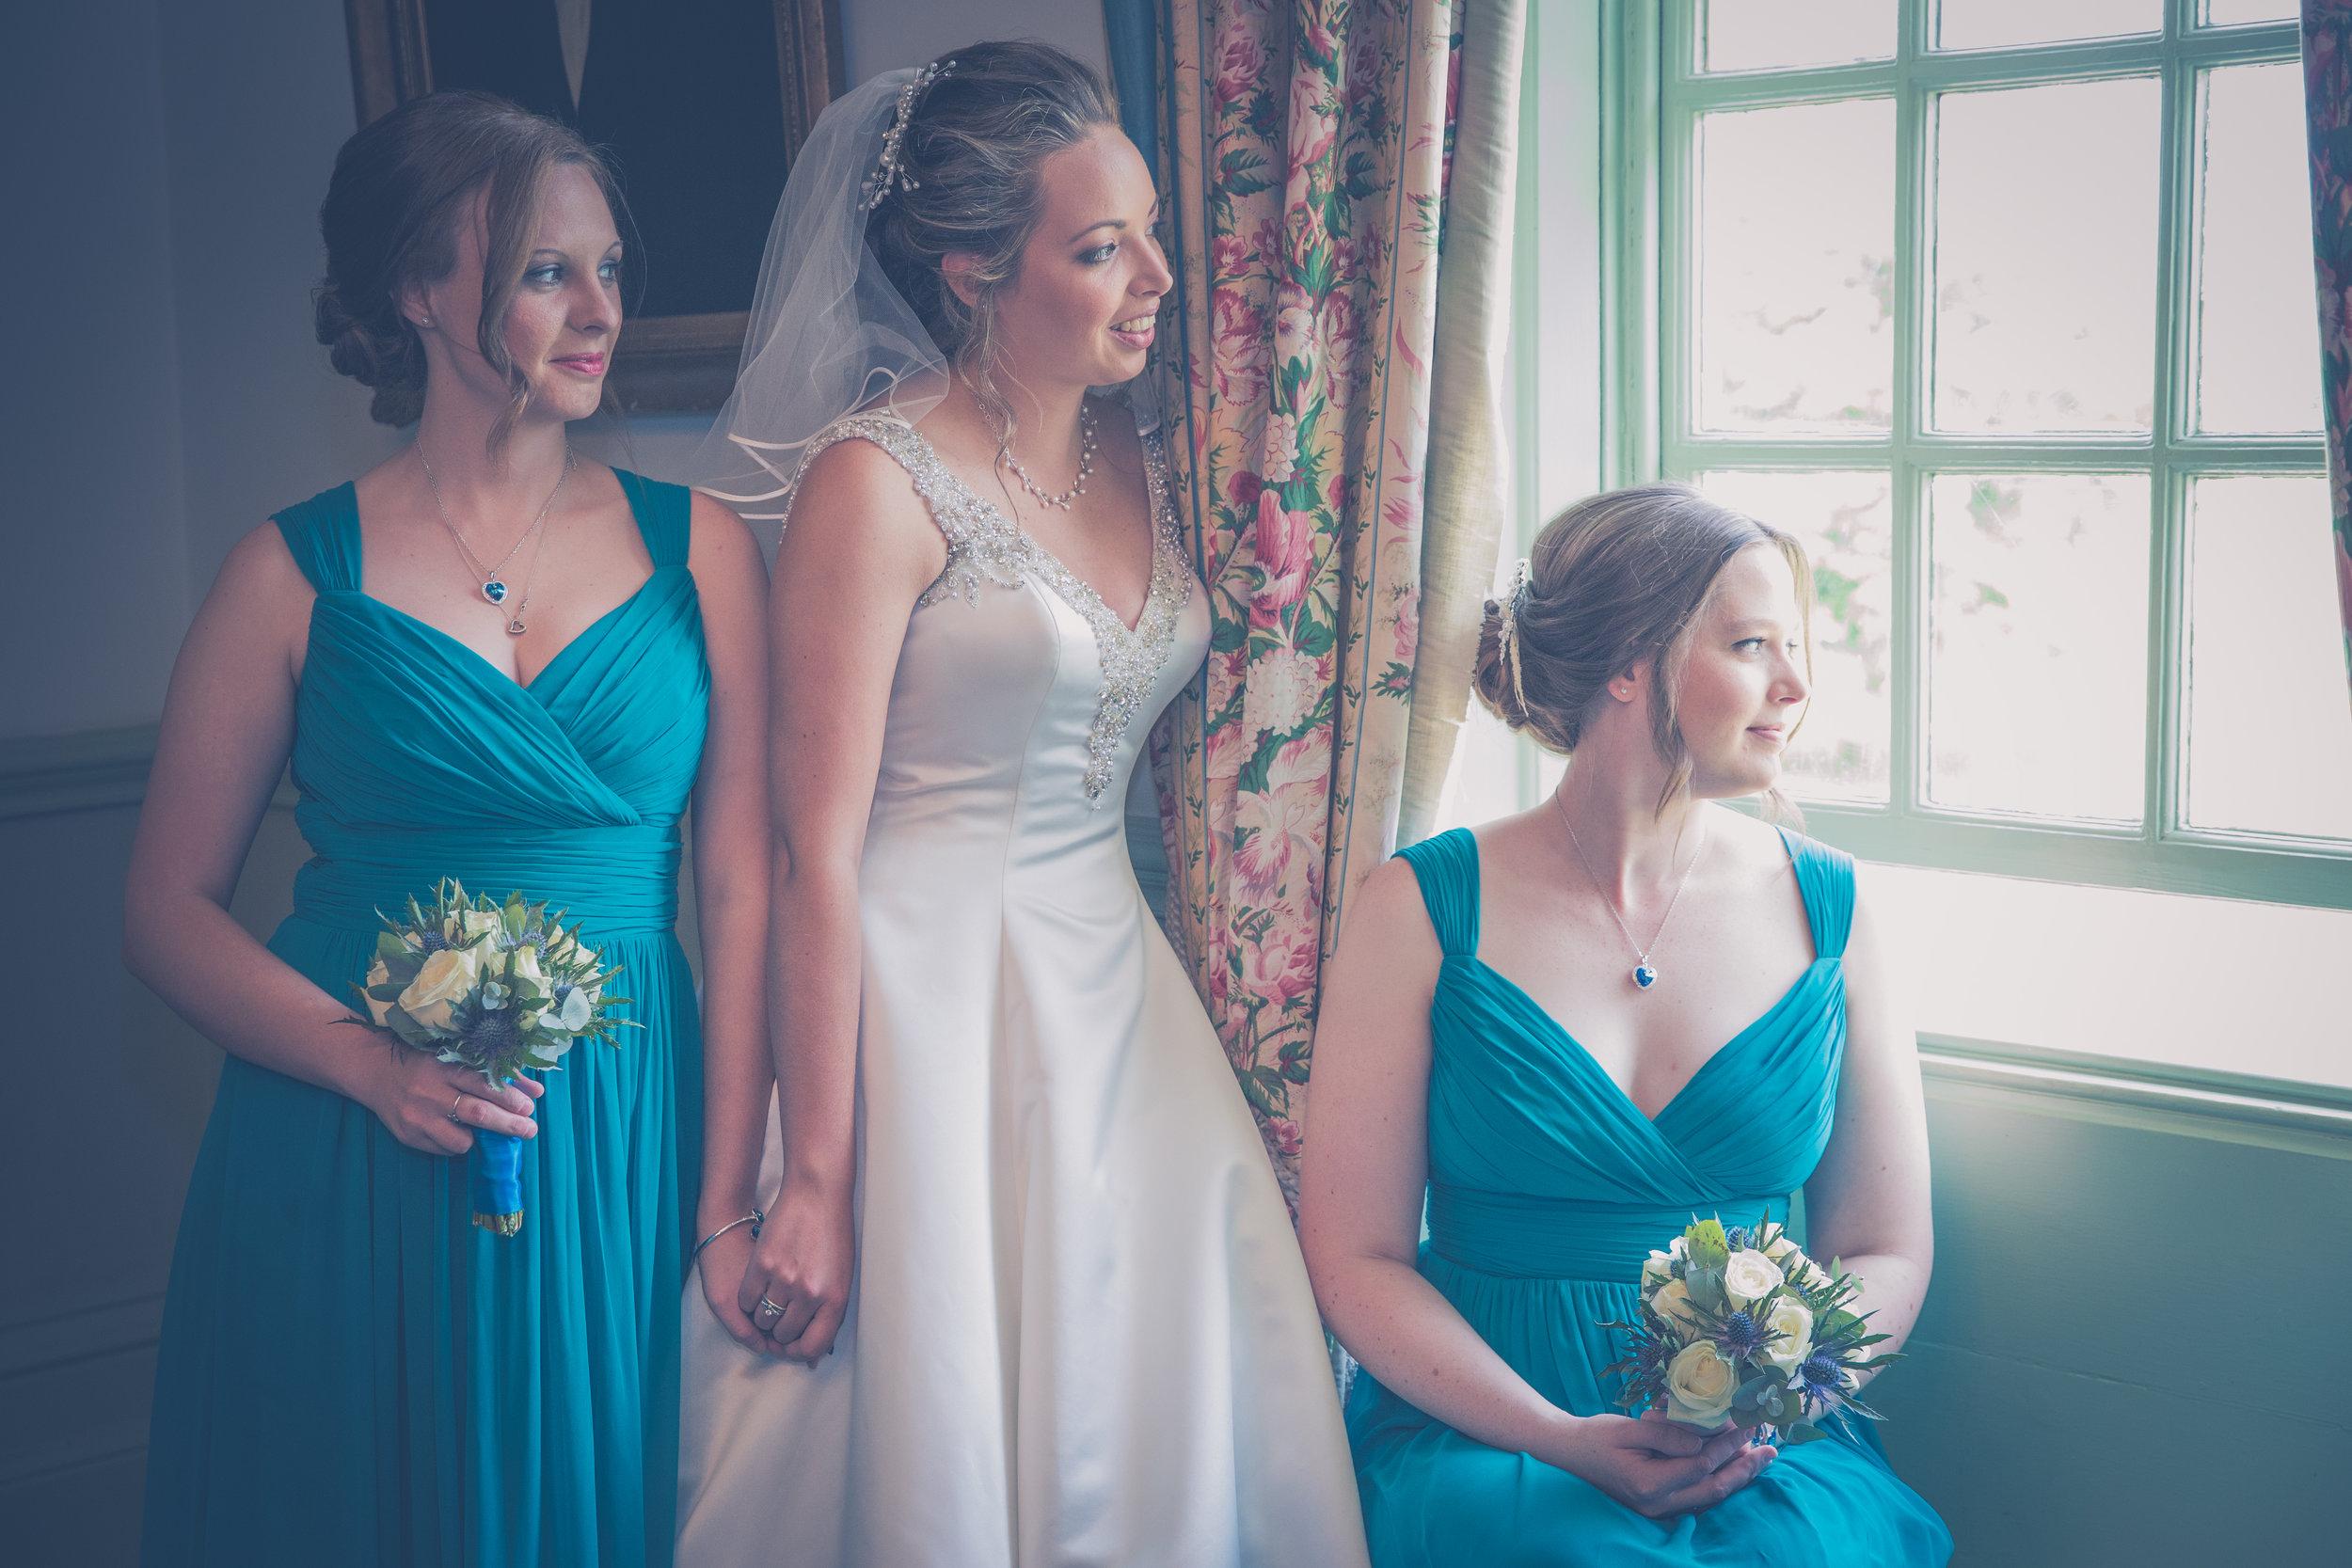 chilston-park-bride-bridesmaids.jpeg